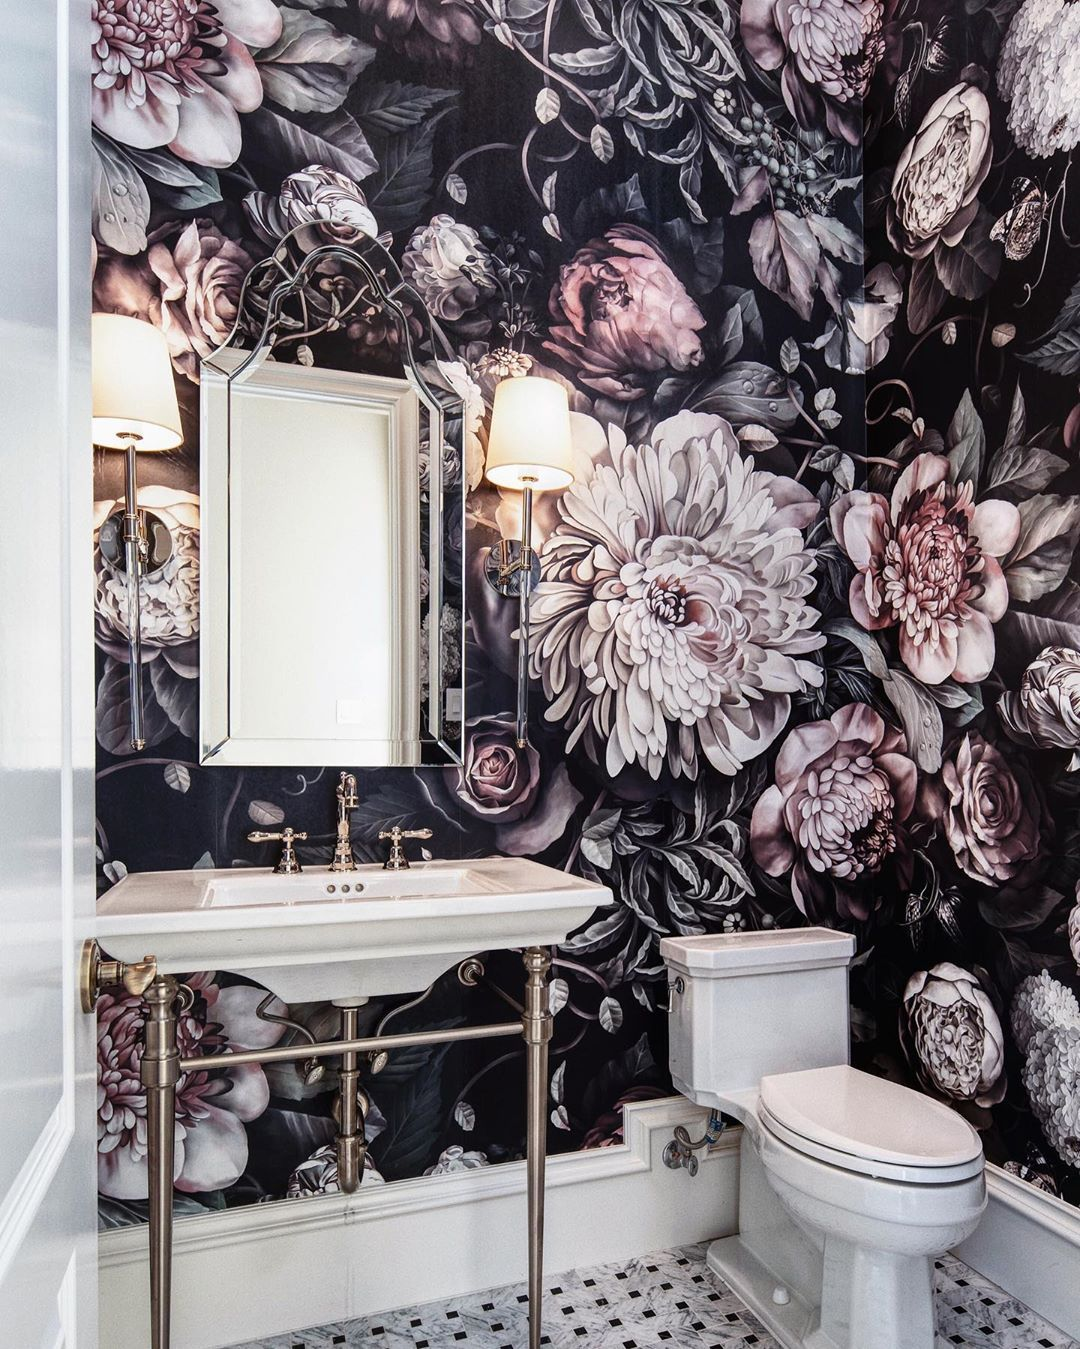 Dark Floral Ii Black Desaturated Xl 200 Wallpaper In 2020